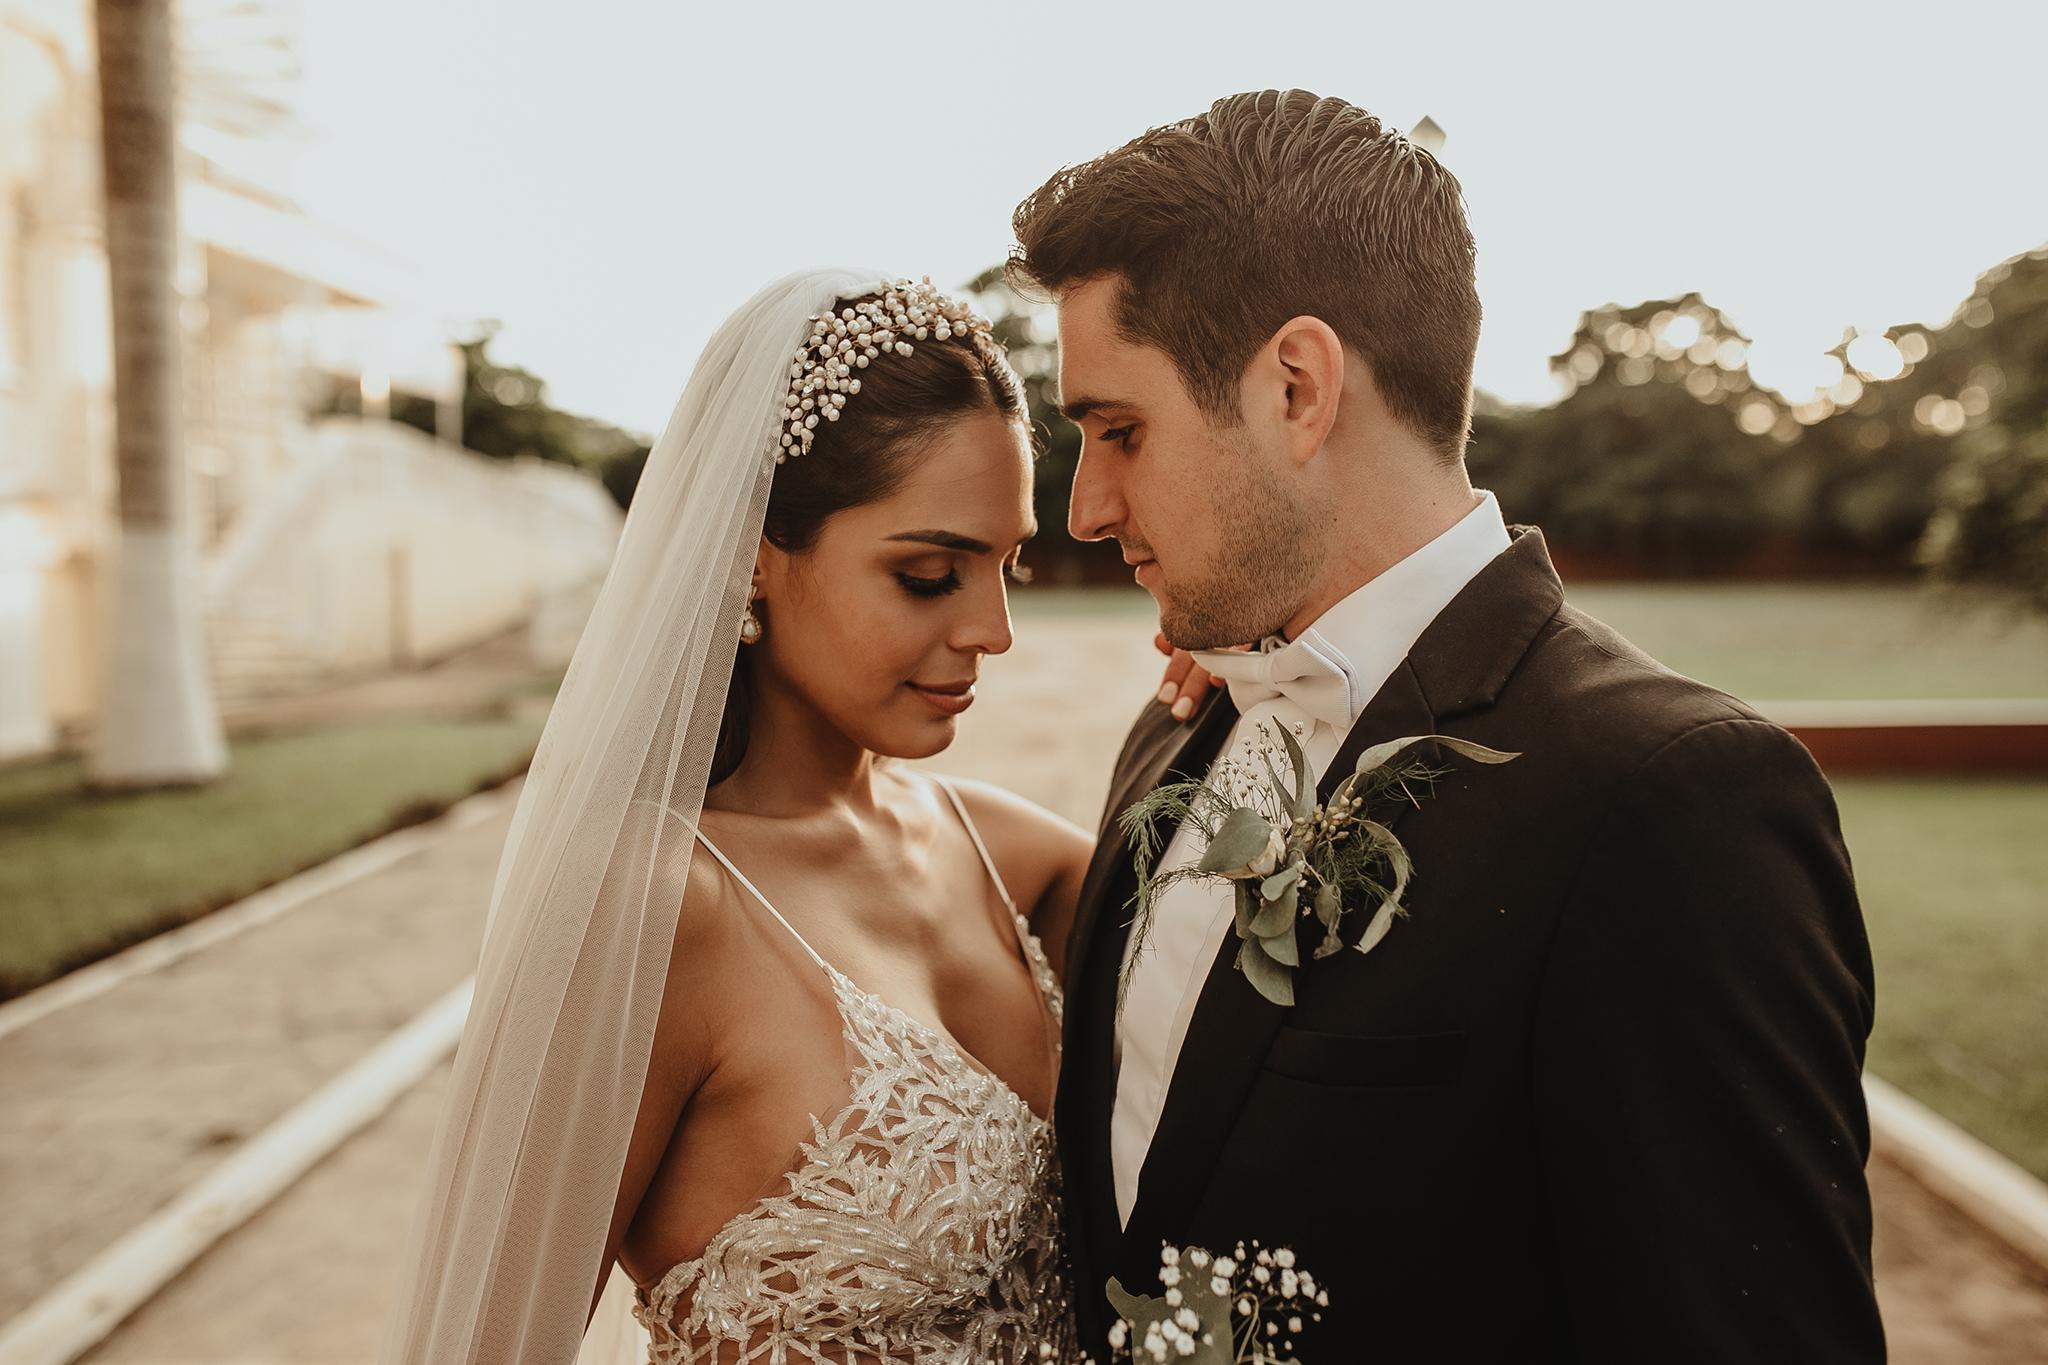 0806R&F__WeddingDestination_Weddingmerida_BodaMexico_FotografoDeBodas_FabrizioSimoneenFotografo.jpg